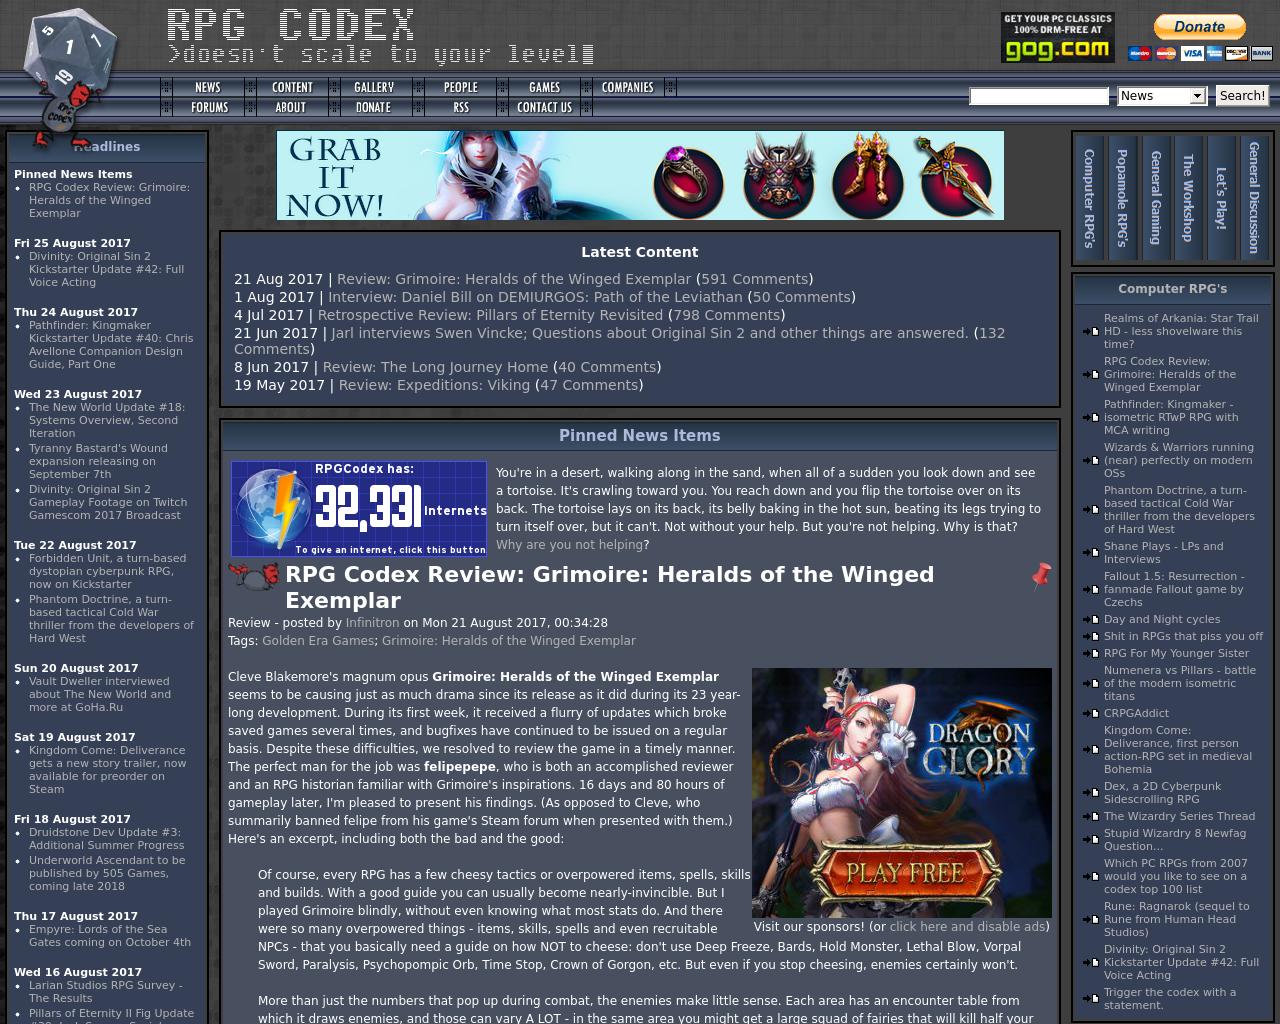 RPG-Codex-Advertising-Reviews-Pricing